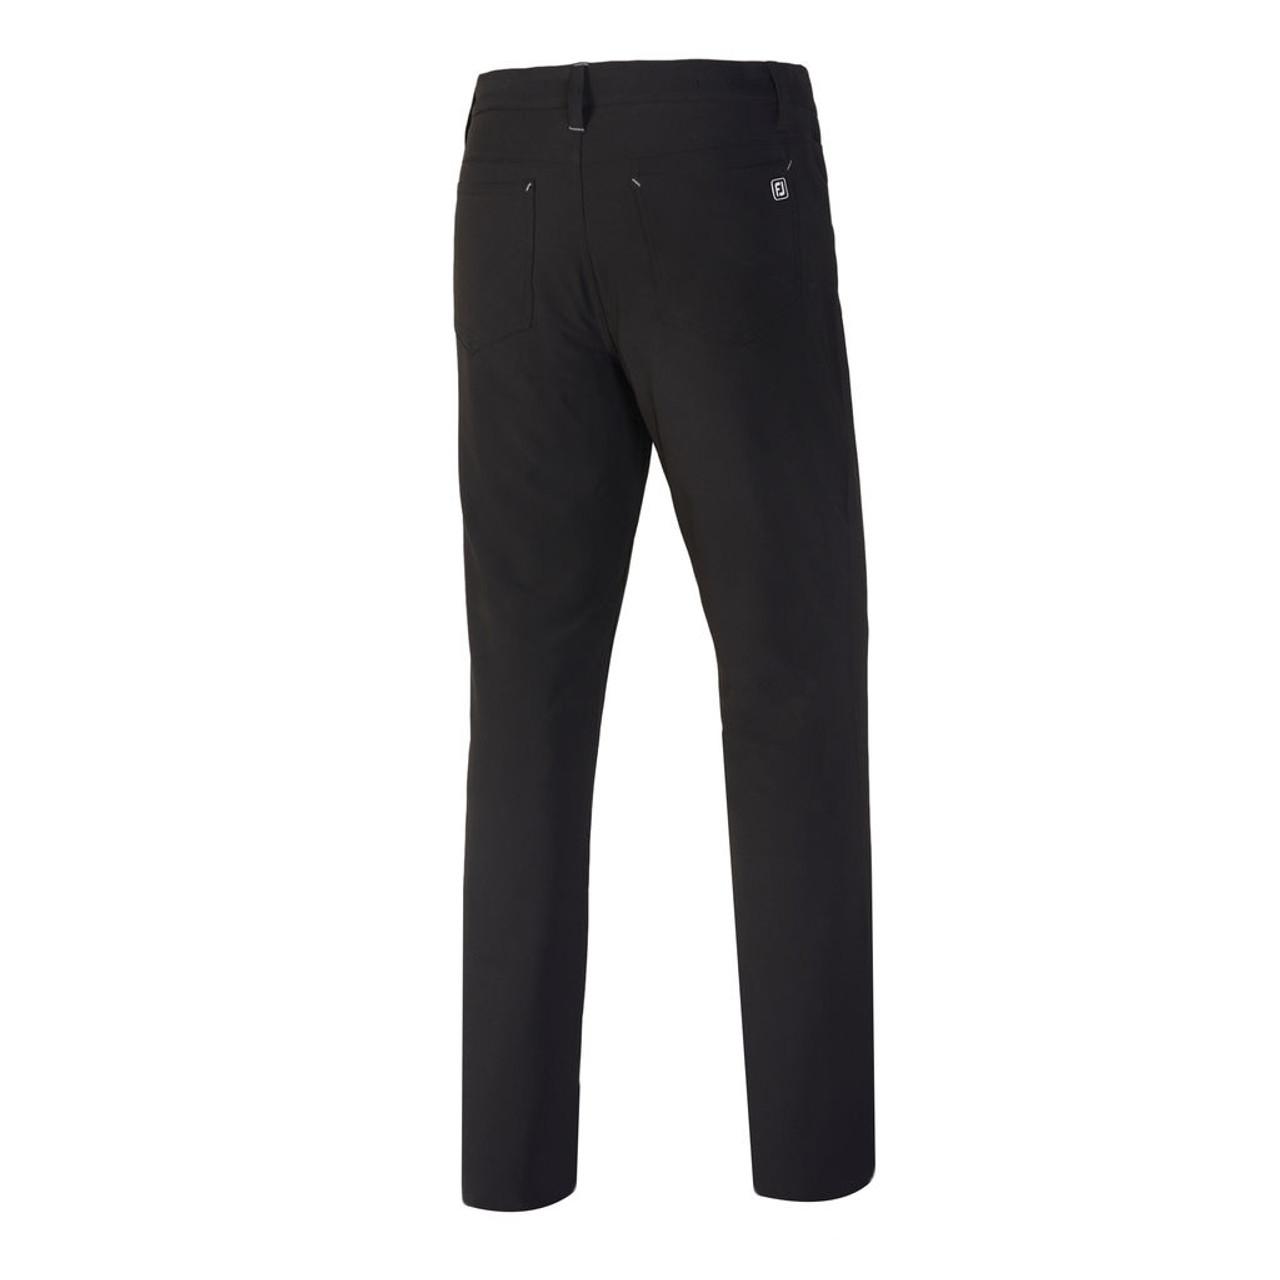 FootJoy Athletic Fit Performance 5-Pocket Pants - Black (24193)